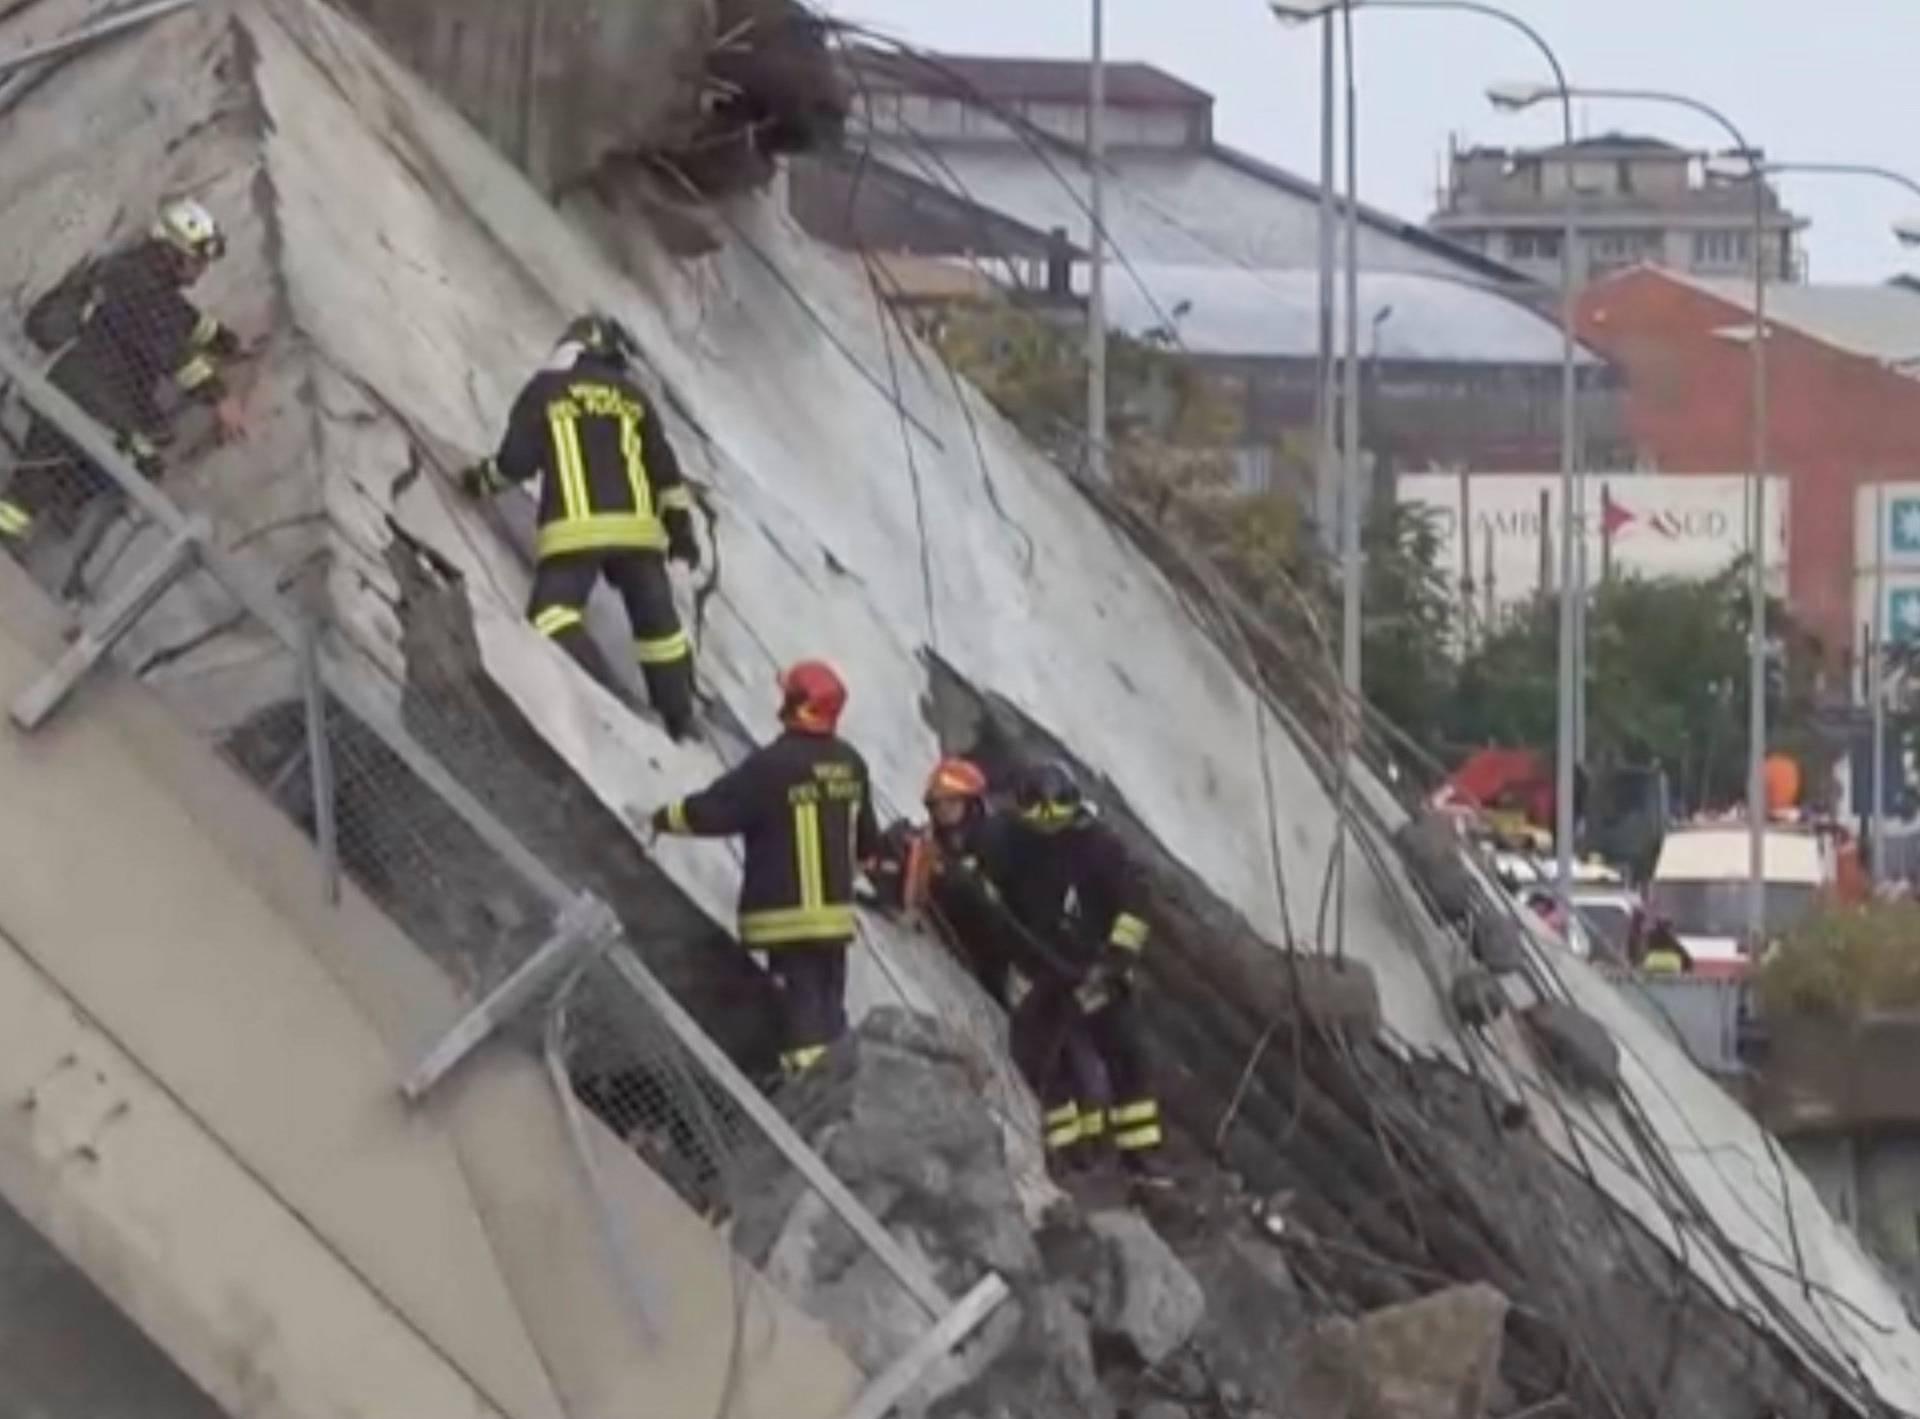 Rescue workers are seen at the collapsed Morandi Bridge in the Italian port city of Genoa